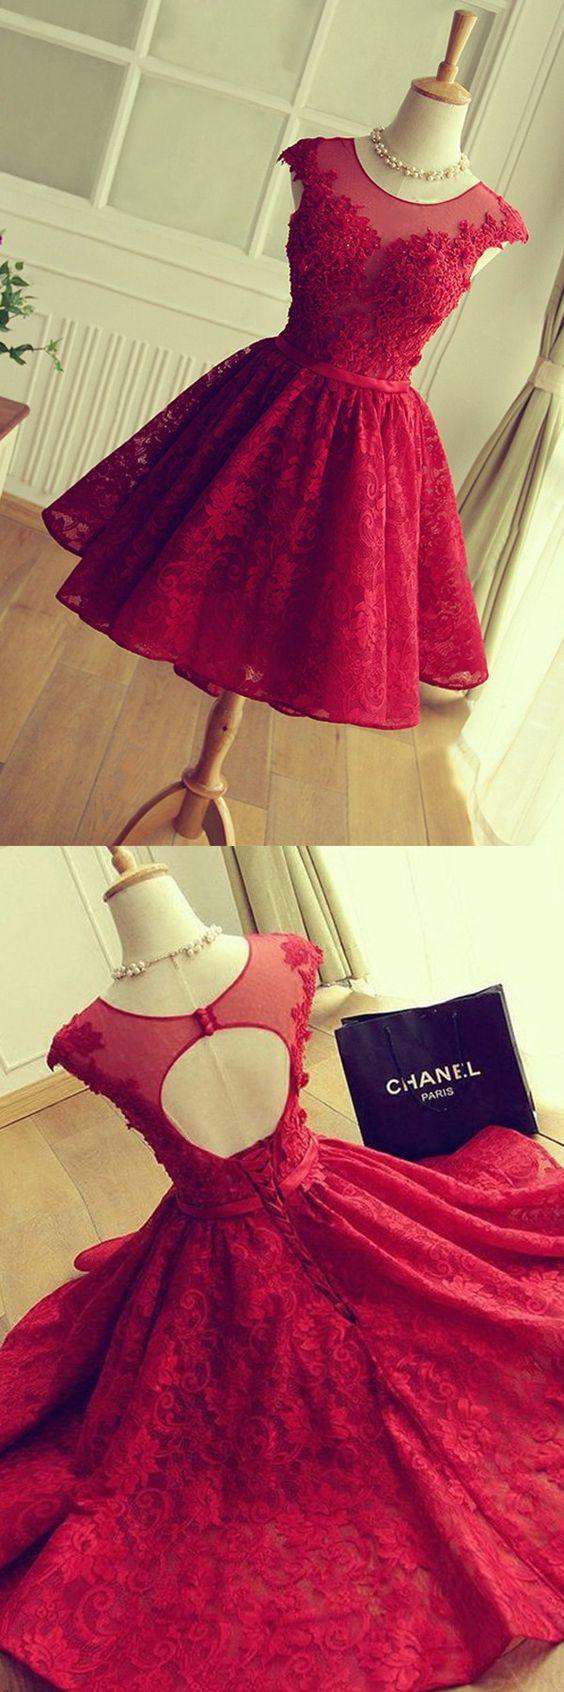 2016 homecoming dresses,homecoming dresses,short prom dresses,red homecoming dresses,lace homecoming dresses,fancy hoco dresses for teens